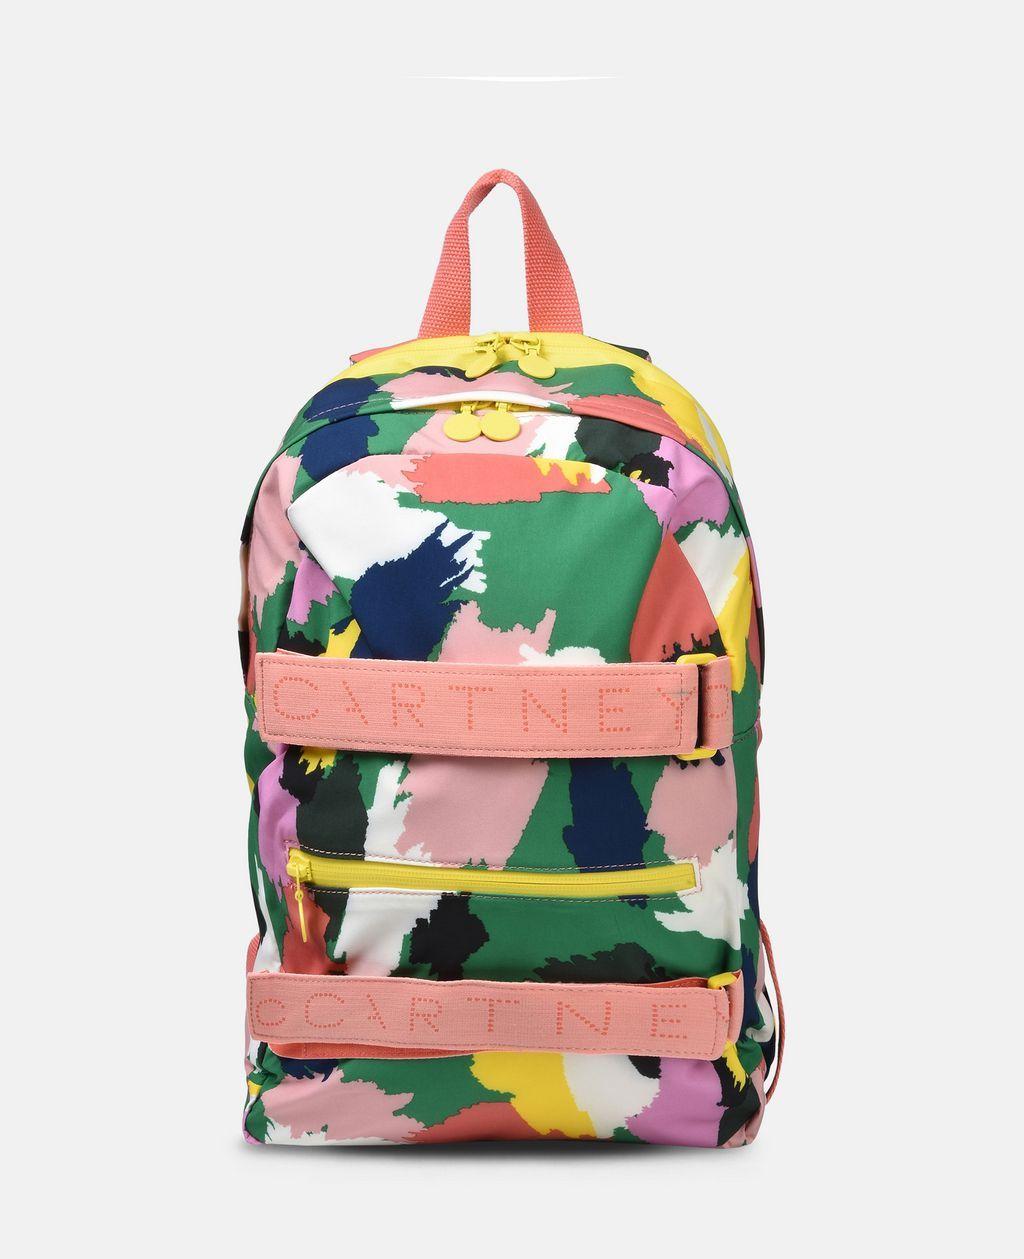 Stellamax Girls Kids Backpack